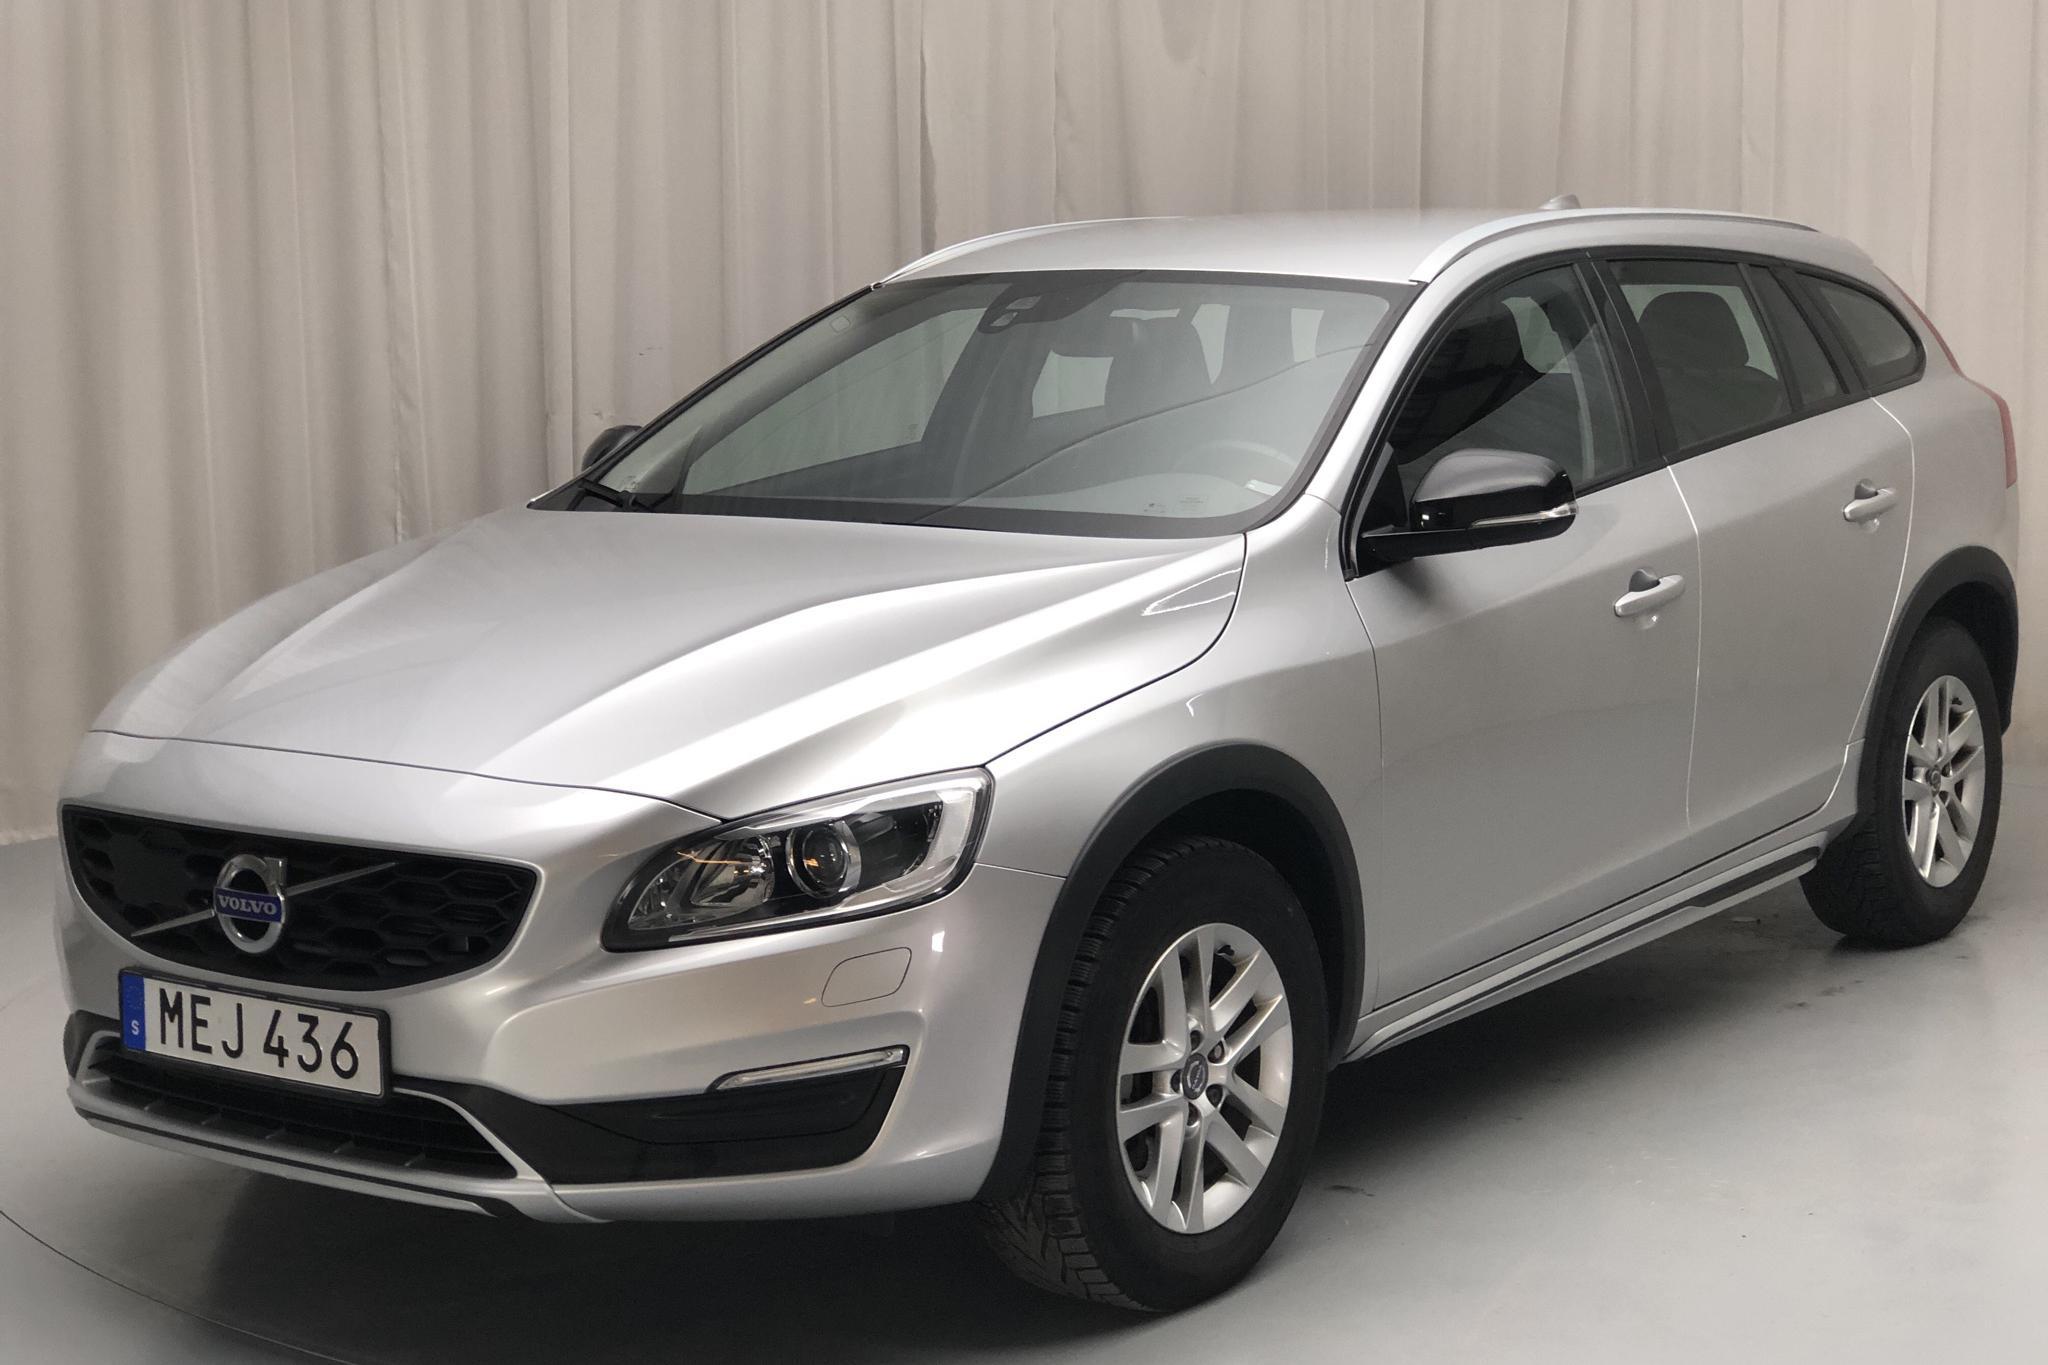 Volvo V60 D3 Cross Country (150hk) - 10 281 mil - Manuell - silver - 2016